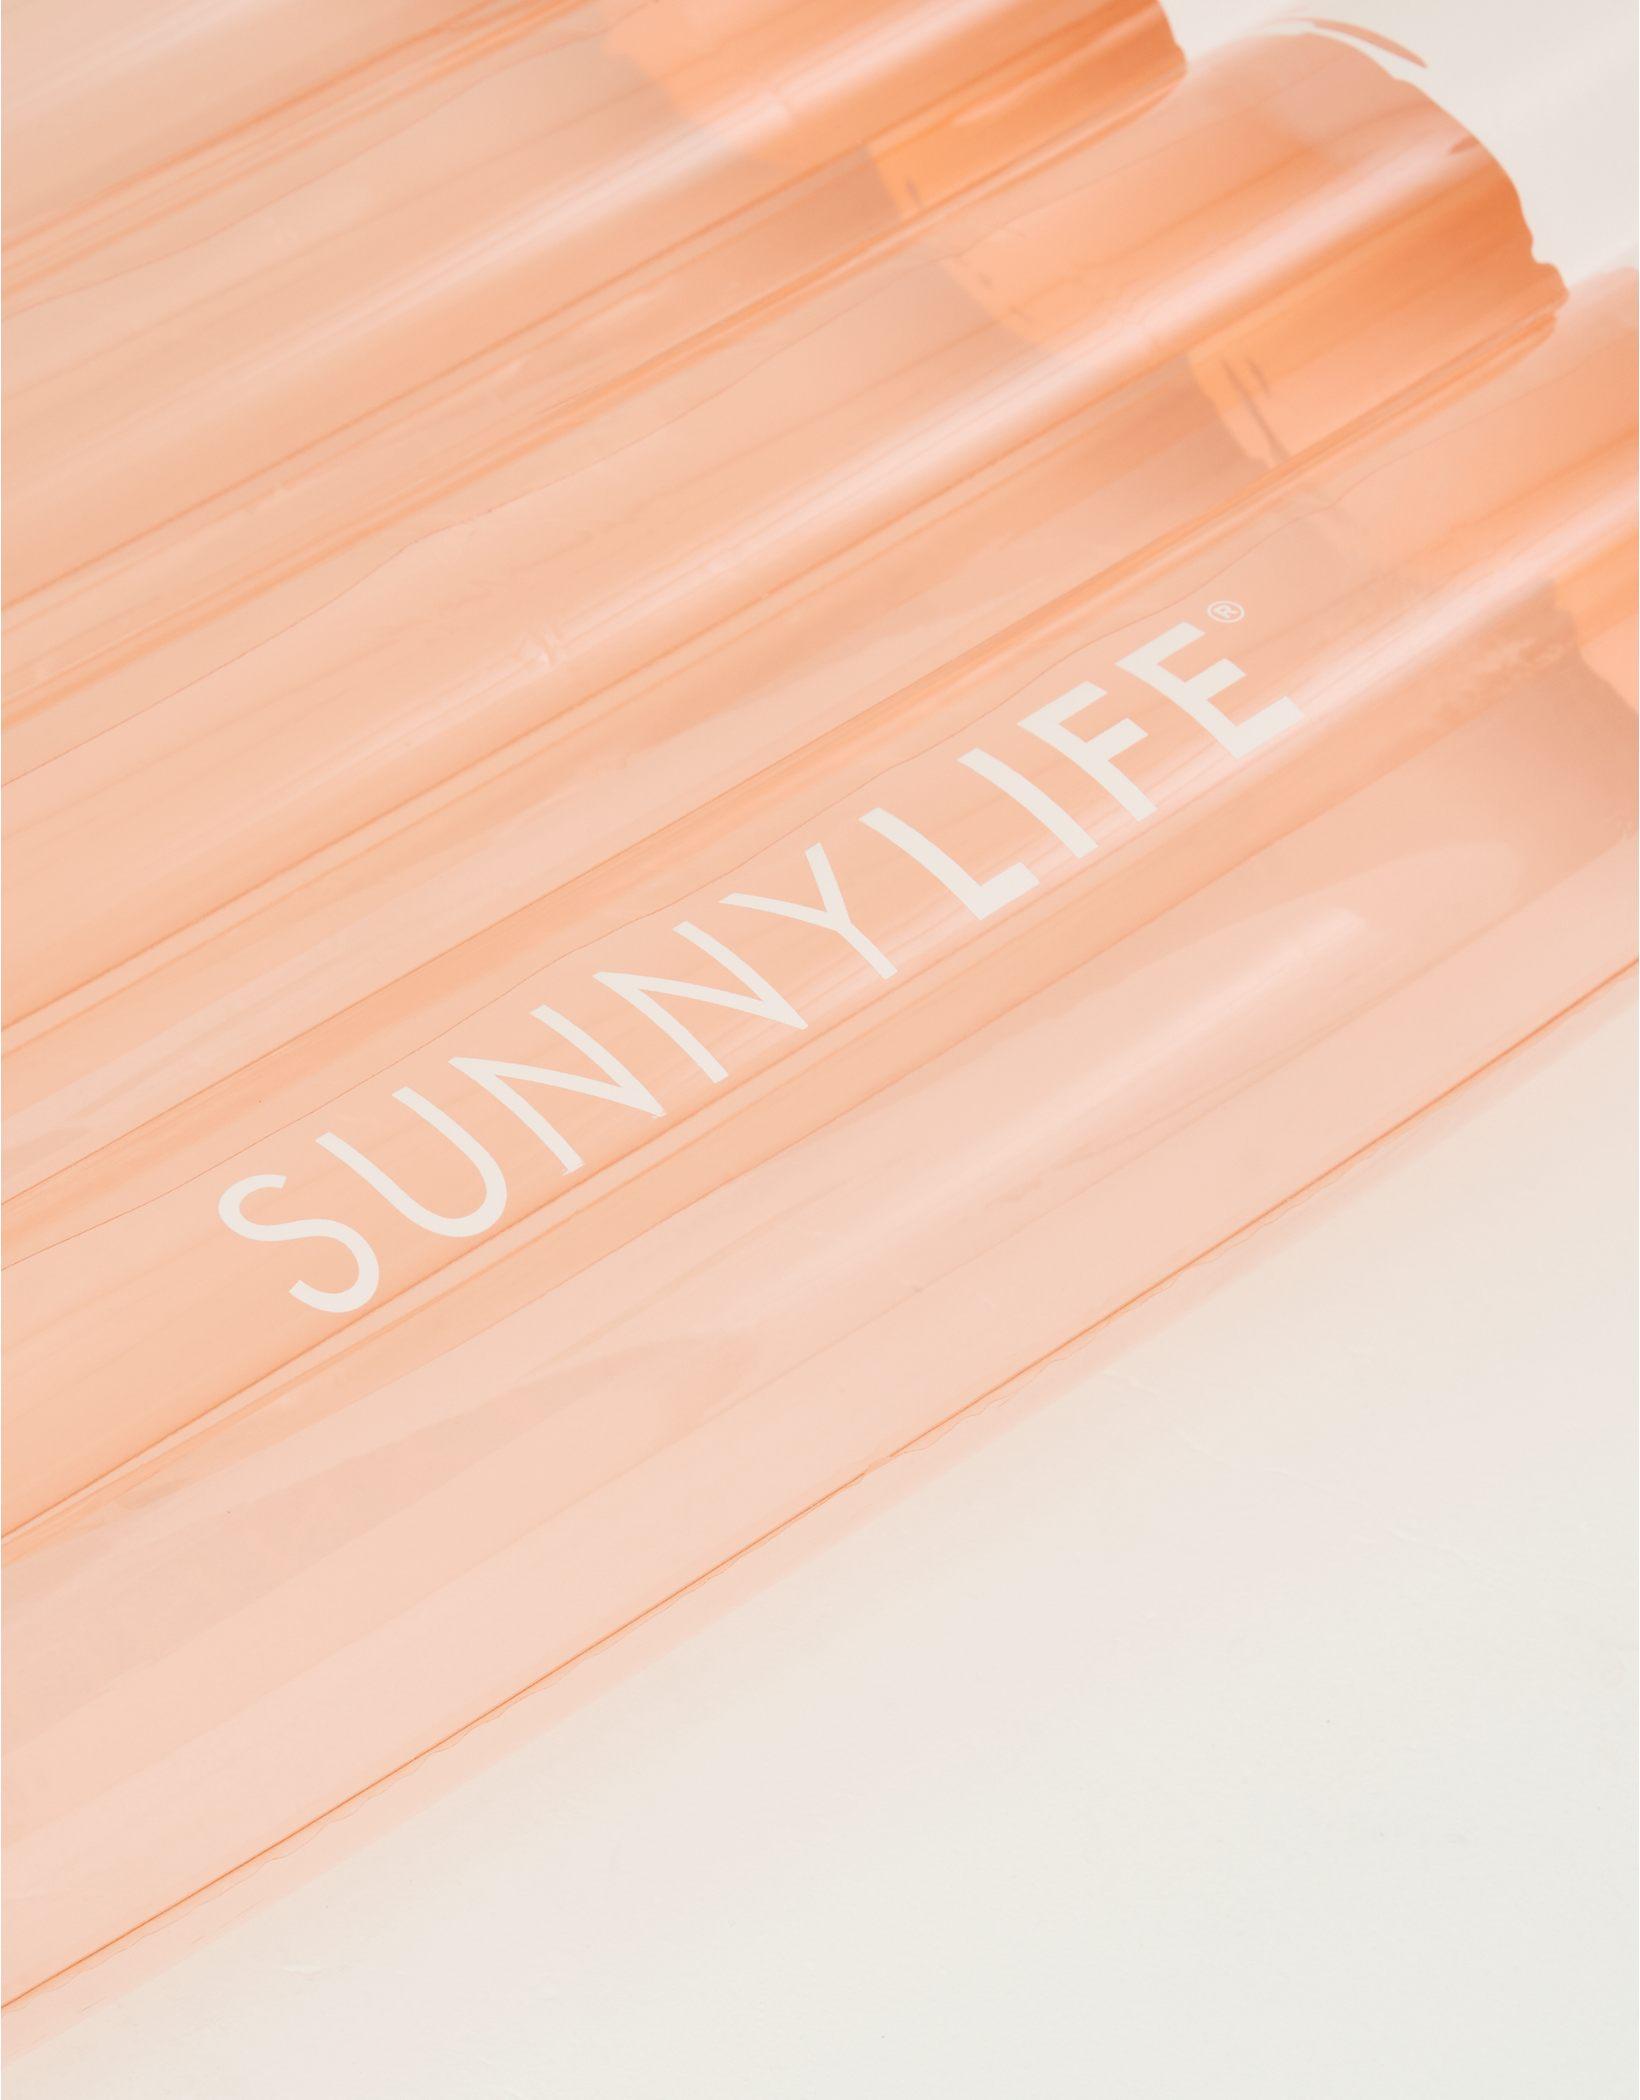 SunnyLife Lie On Surfboard